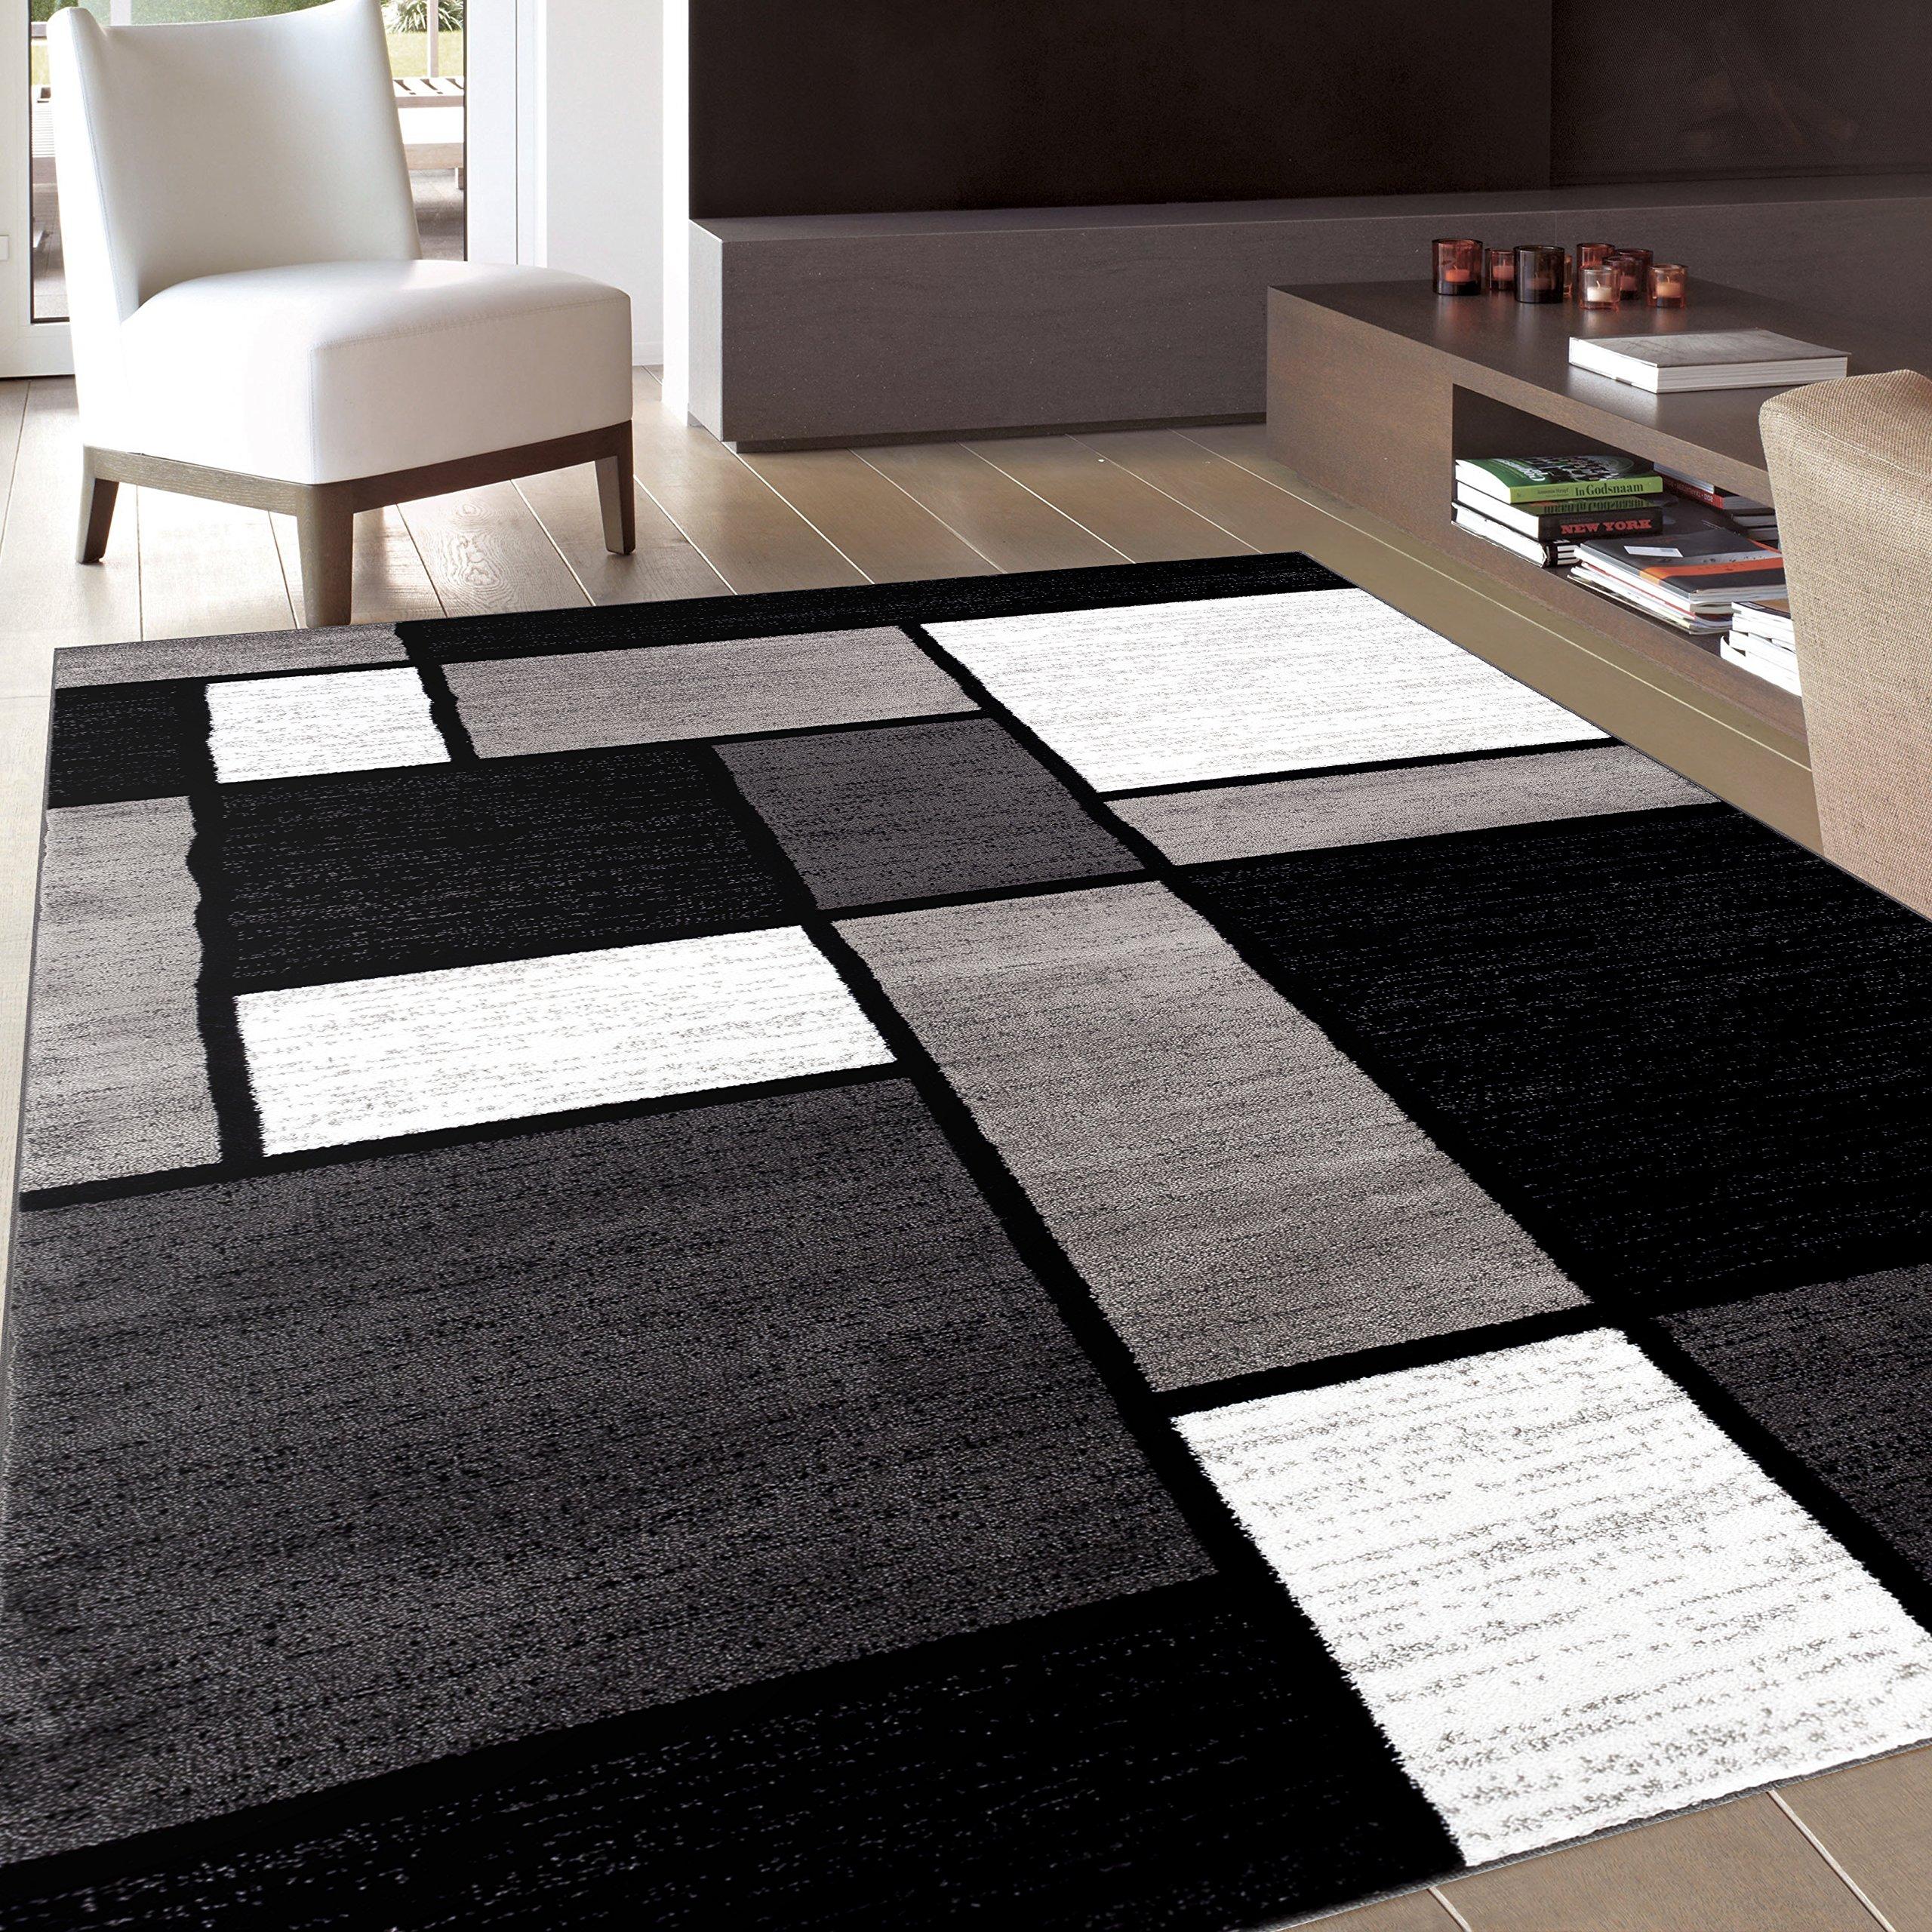 Rug Decor Contemporary Modern Boxes Area Rug, 5' 3'' by 7' 3'', Grey